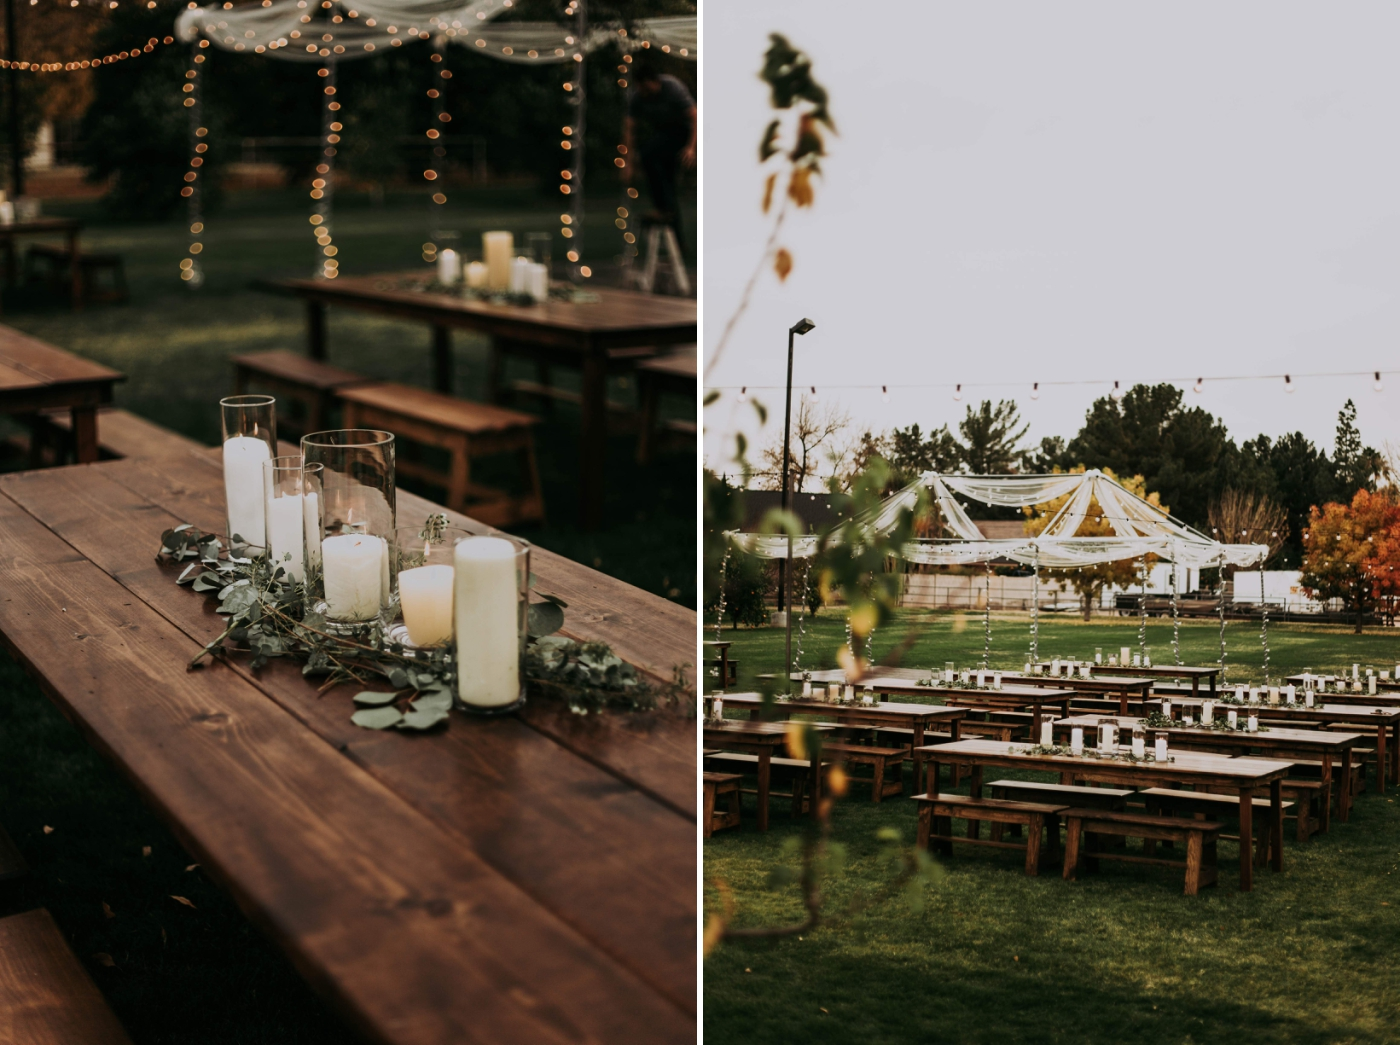 How to Plan a Backyard Wedding in Arizona - Wood-n-Crate ...